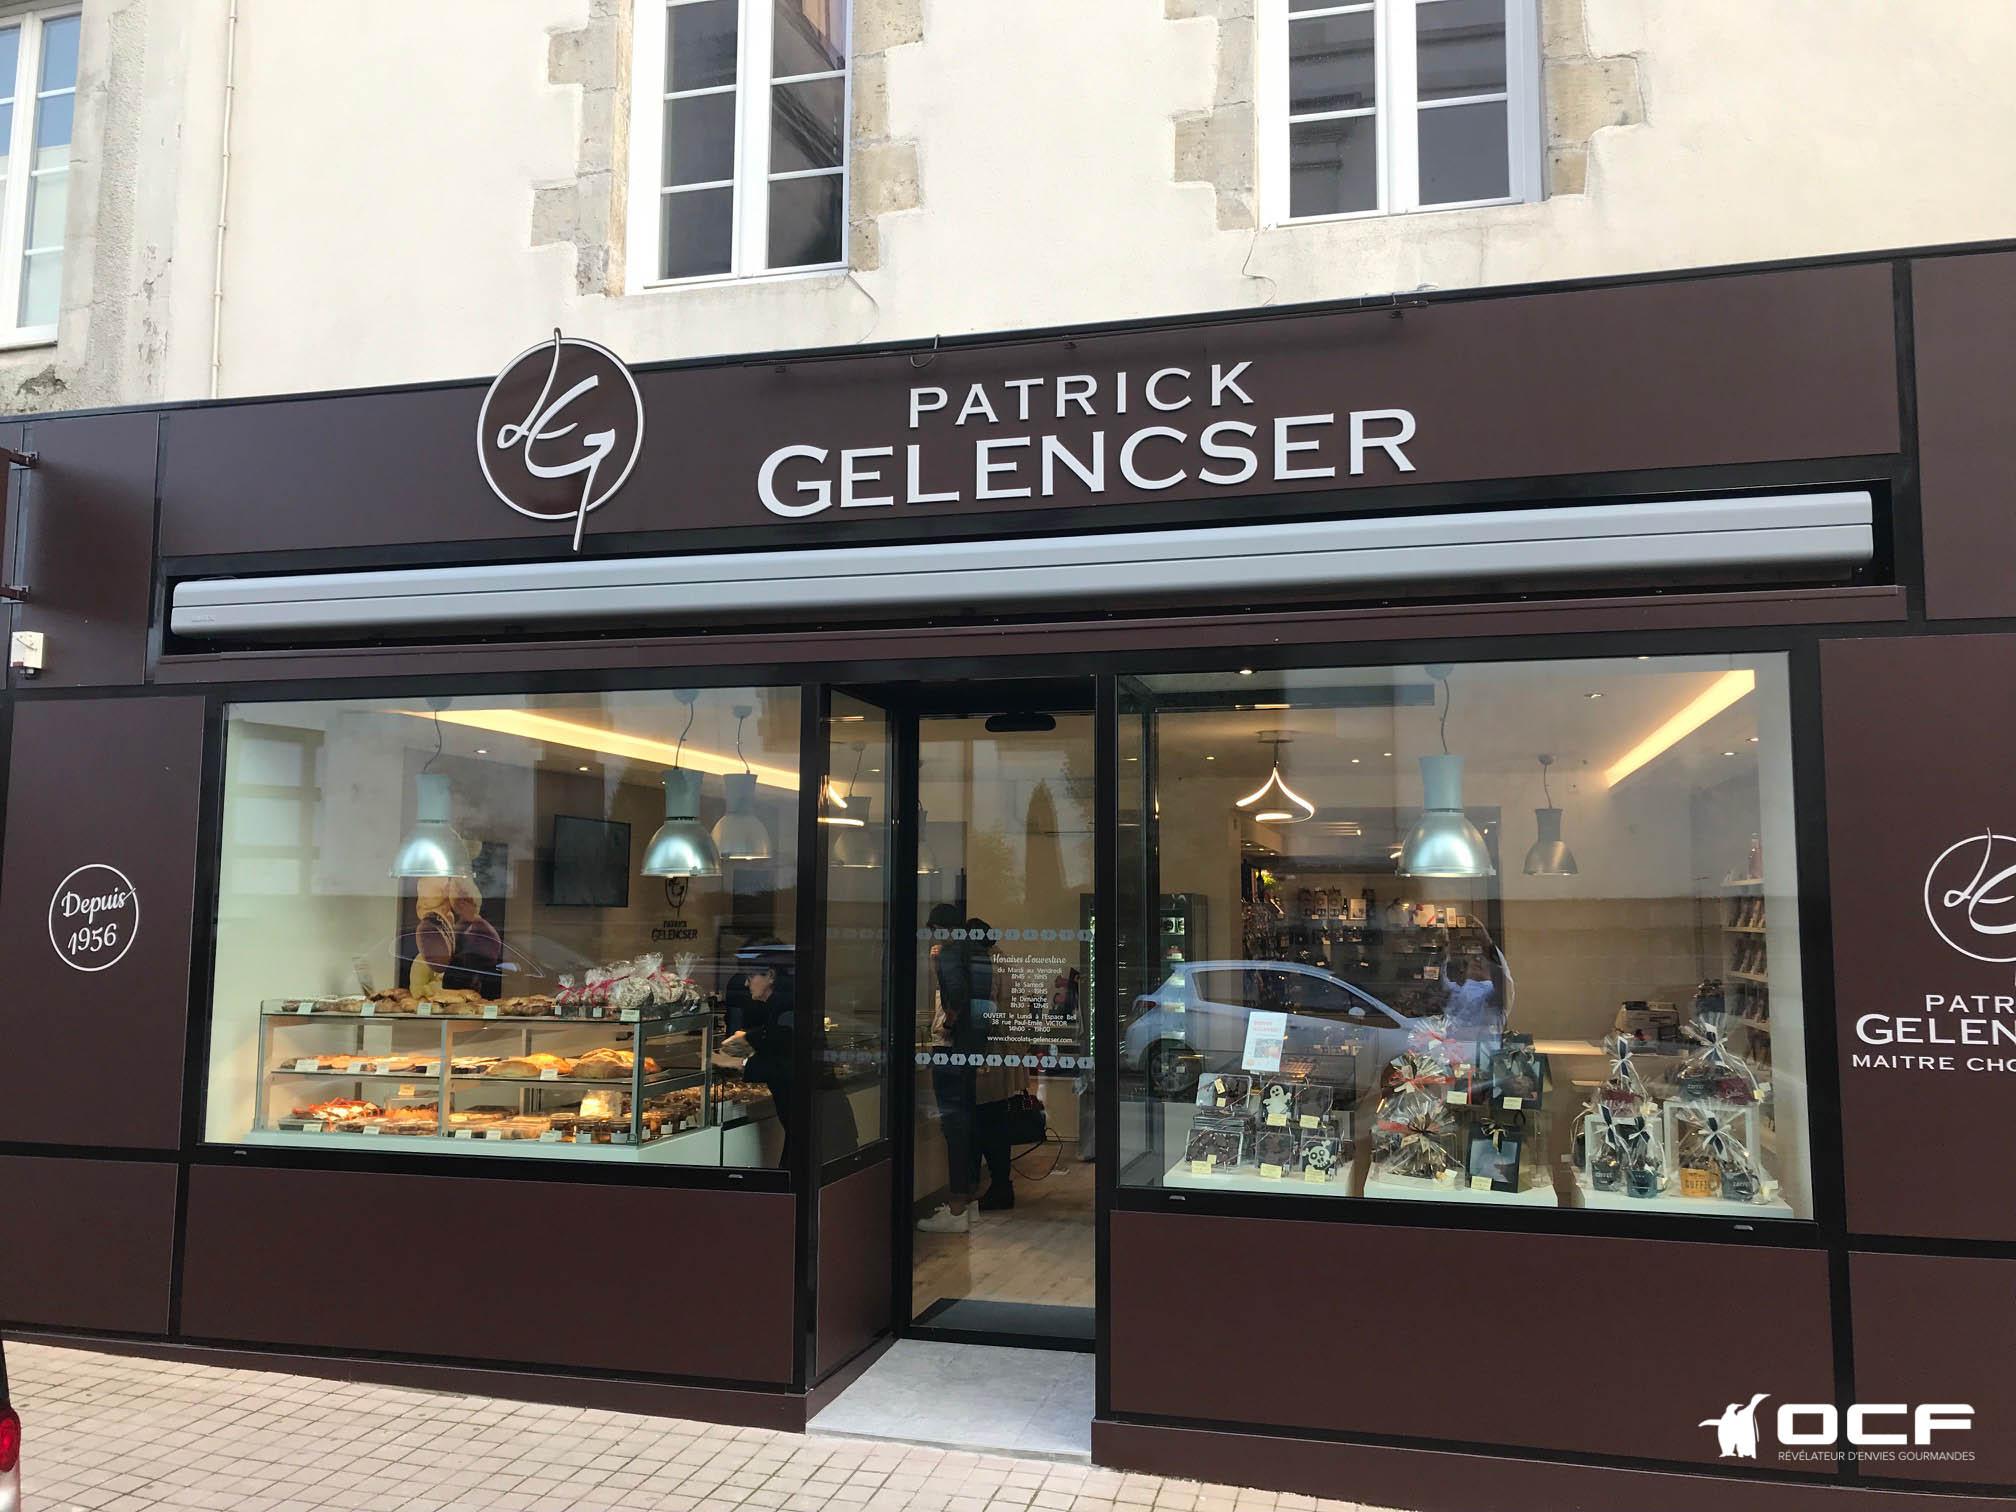 Patrick Gelencser - La Roche-sur-Yon (85) - Vitrine réfrigérée OCF